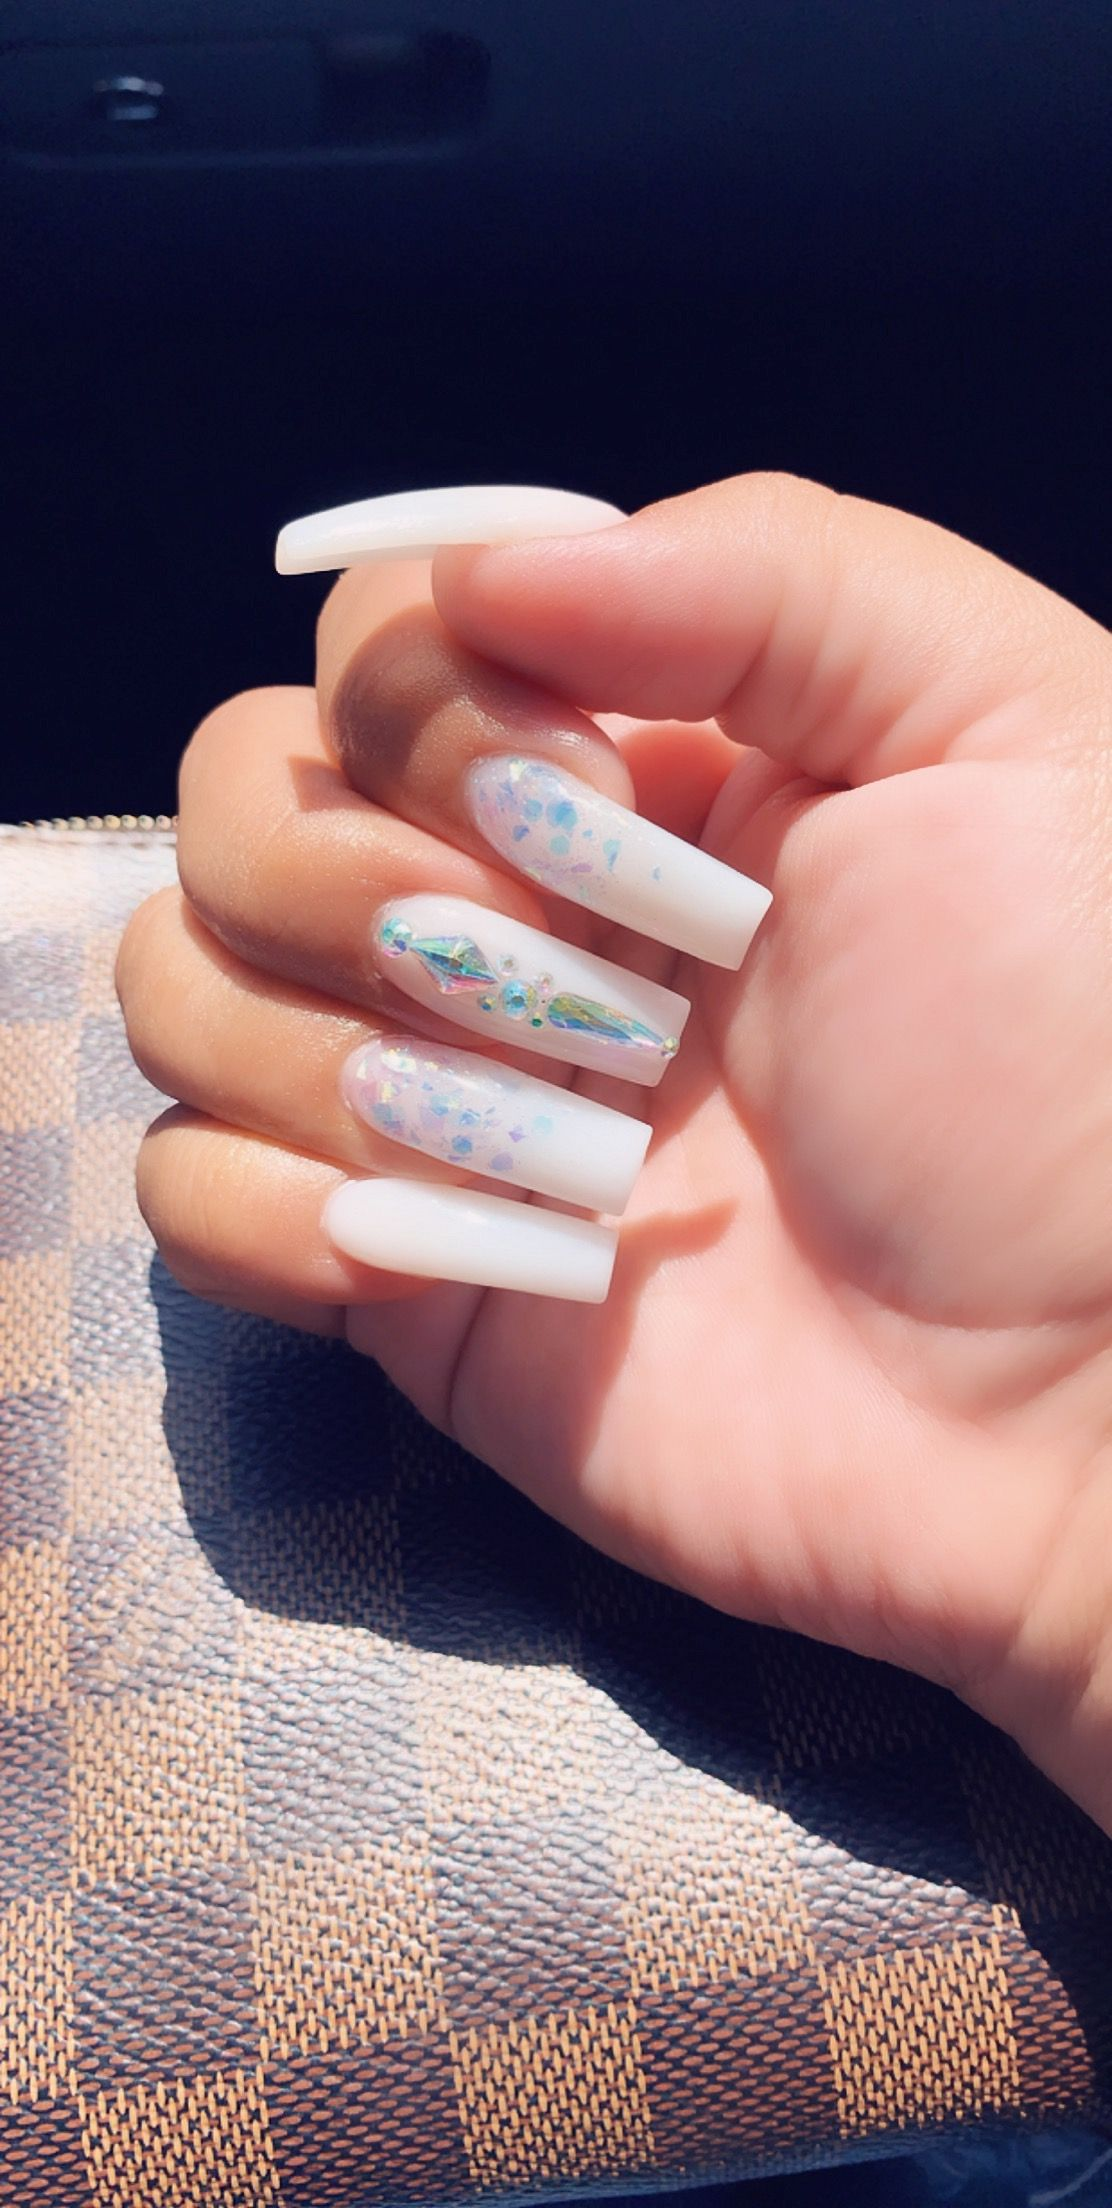 Soft White Acrylic Long Nails Ombre Rhinestone White Acrylic Nails Long Nails Long Square Acrylic Nails